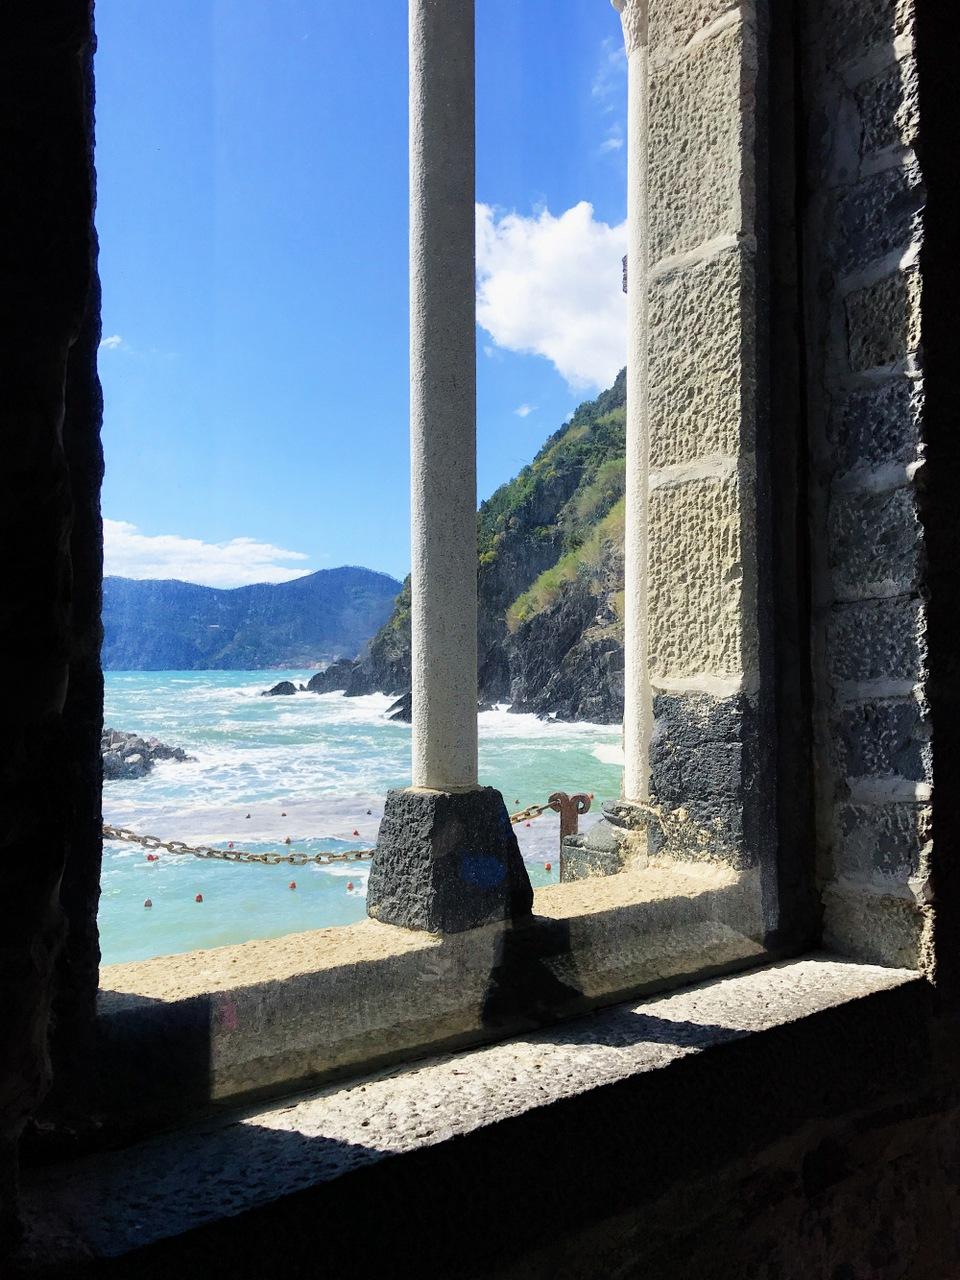 church-vernazza Cinque Terre travel guide One day in Cinque Terre